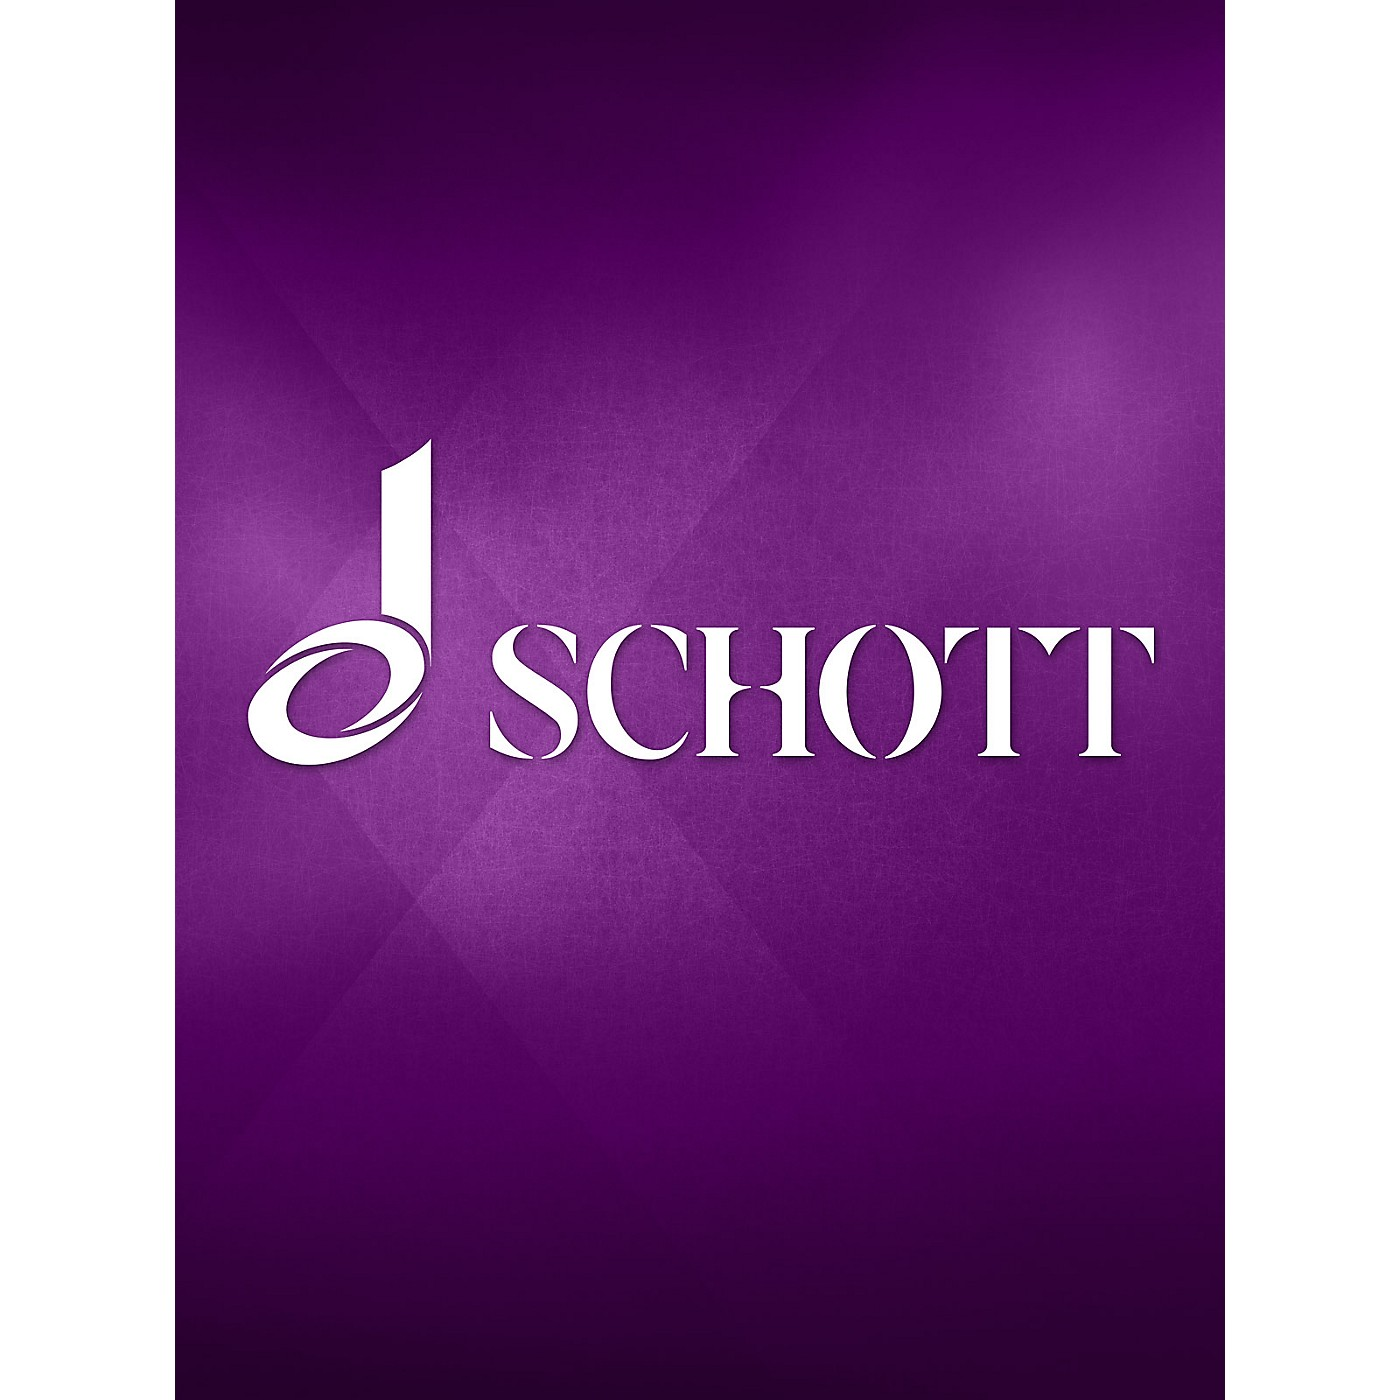 Boelke-Bomart/Schott Trio for Clarinet, Bassoon and Piano Schott Series Softcover  by Stanislaw Skrowaczewski thumbnail